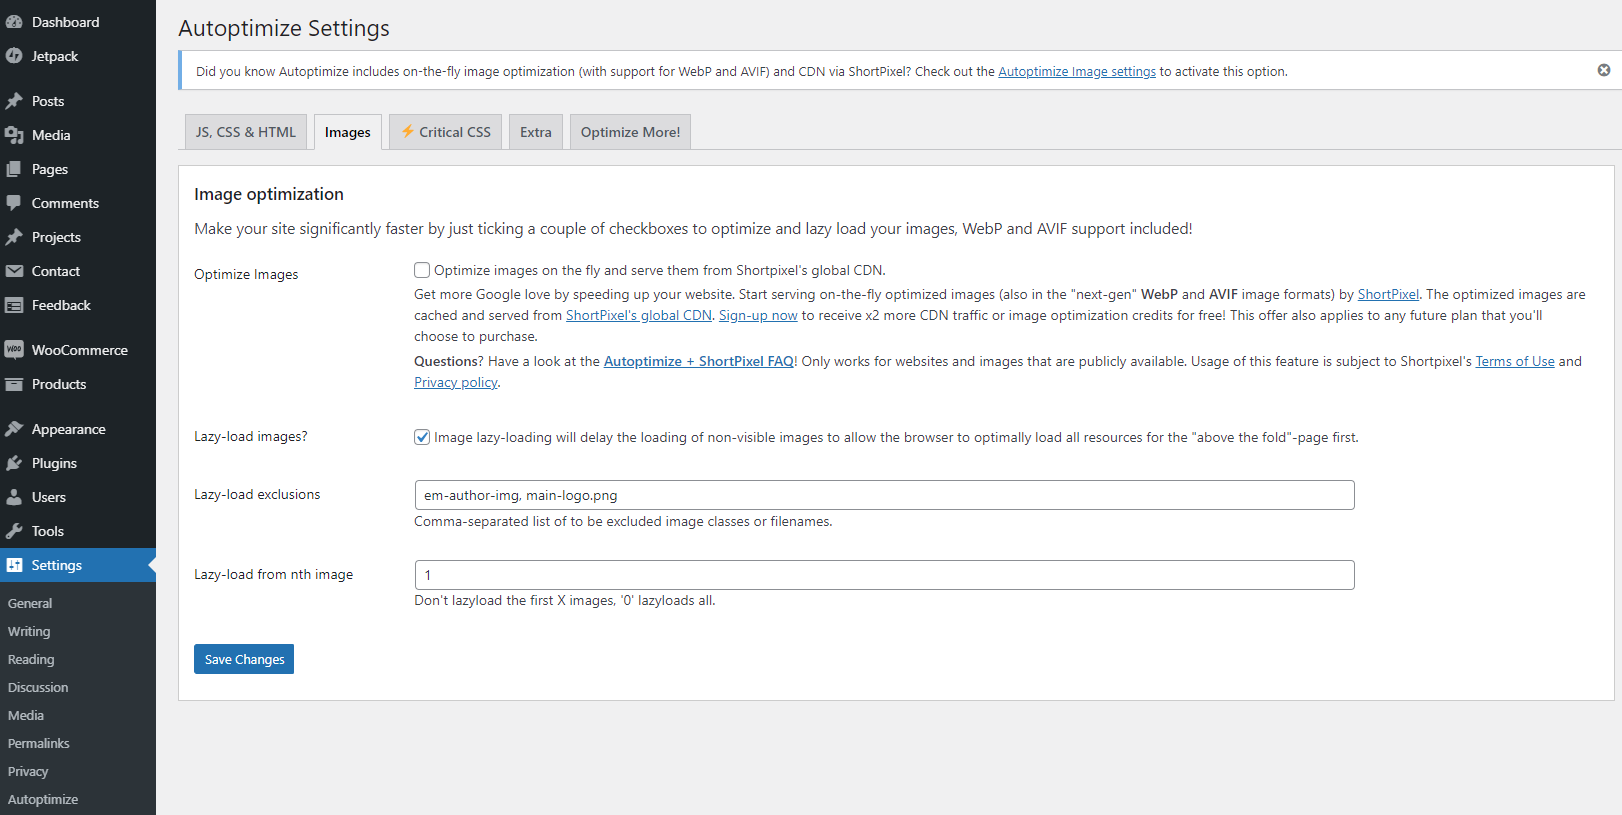 autoptimize exclusions settings